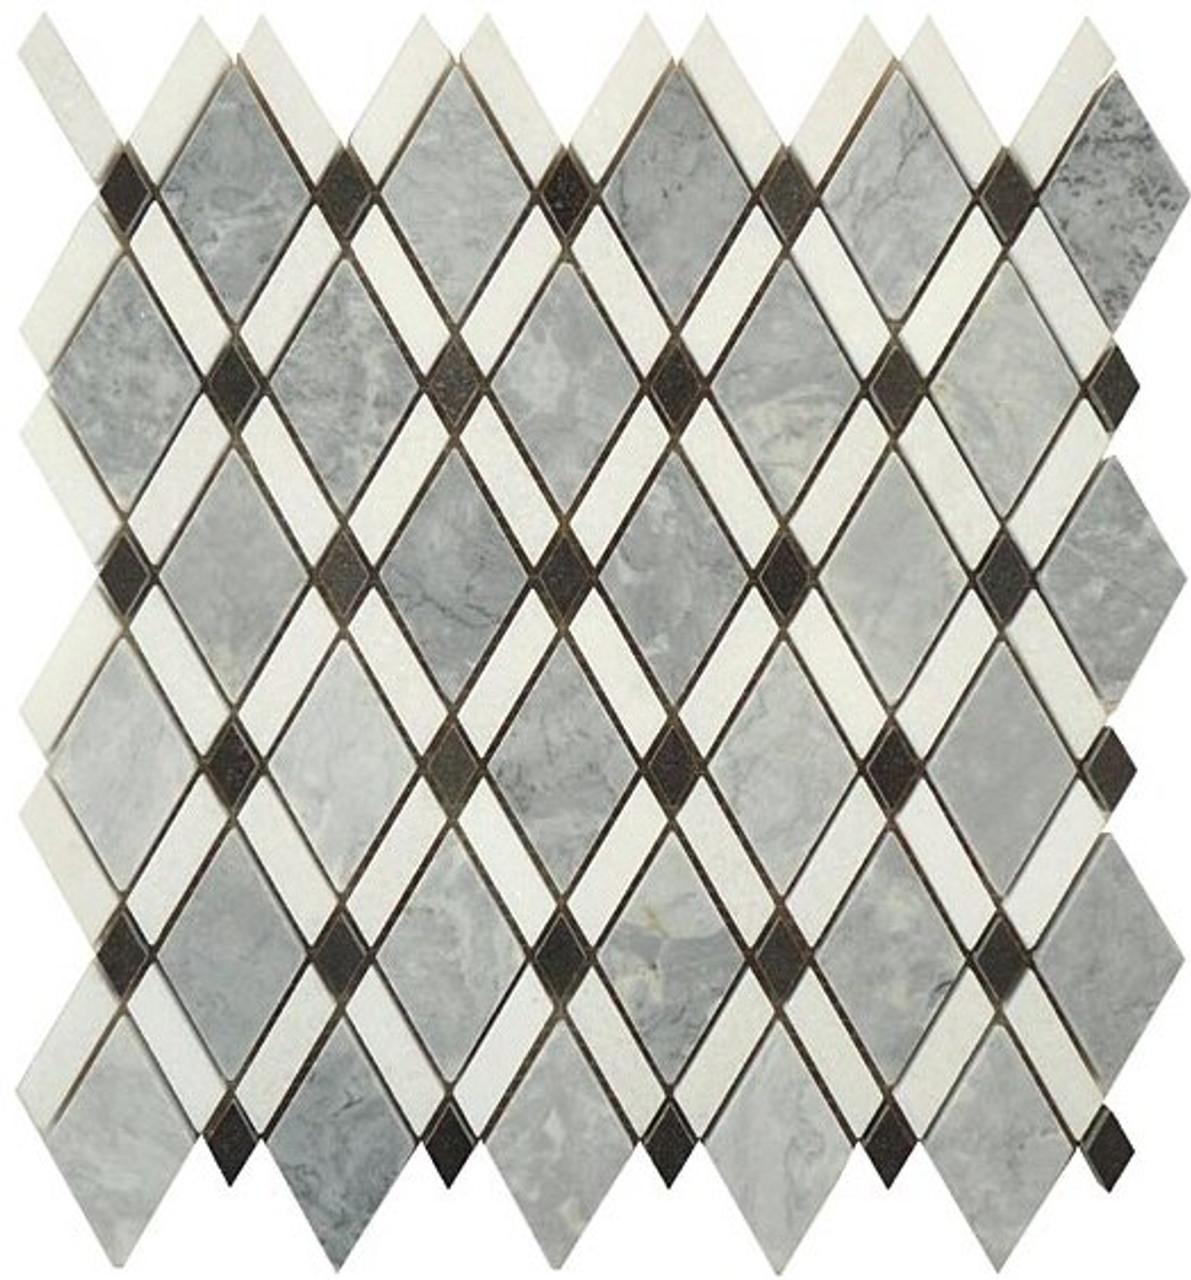 Bella Glass Tiles Diamond Series Mugworth or Thassos White or Basalt